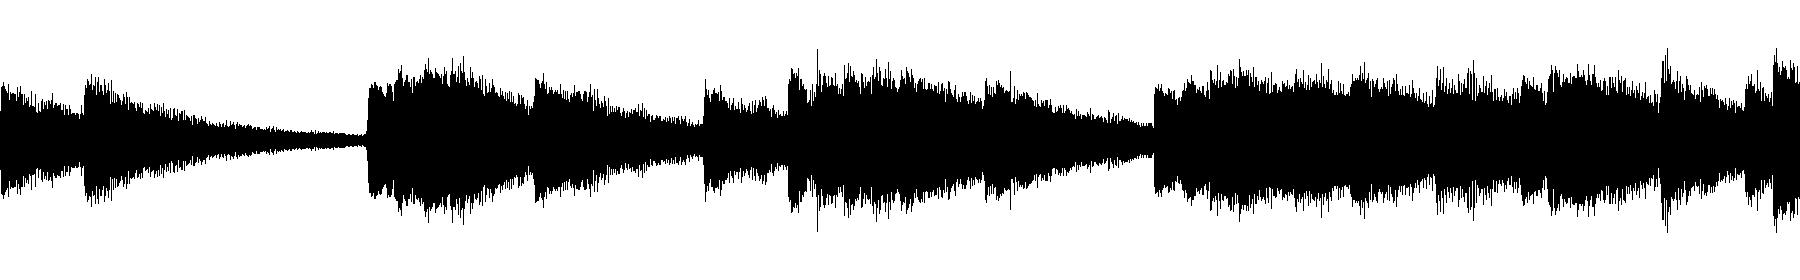 dts chordlp 23b cm wet